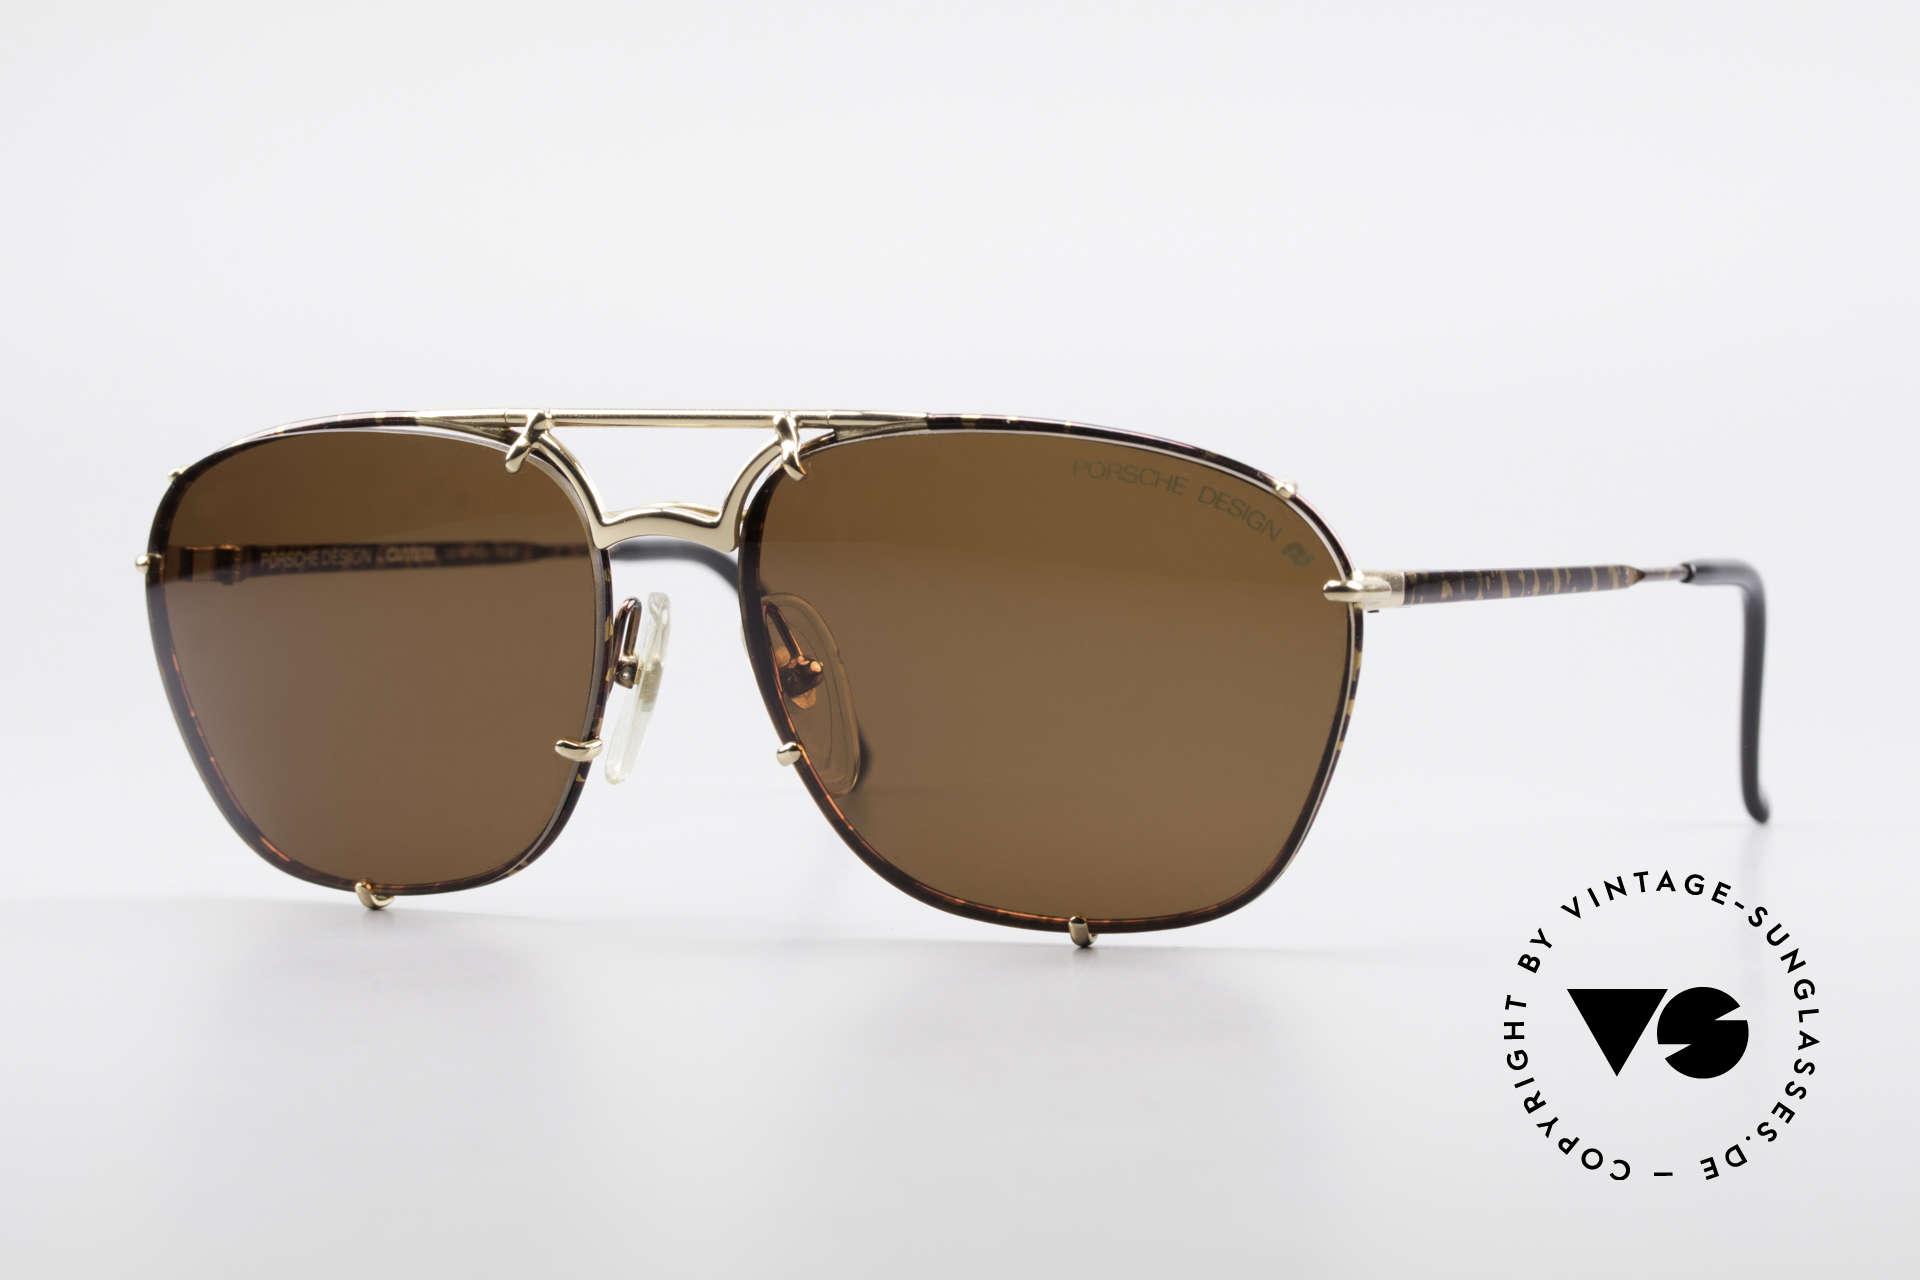 Porsche 5647 90s Classic Vintage Sunglasses, classic men's sunglasses by Porsche Carrera Design, Made for Men